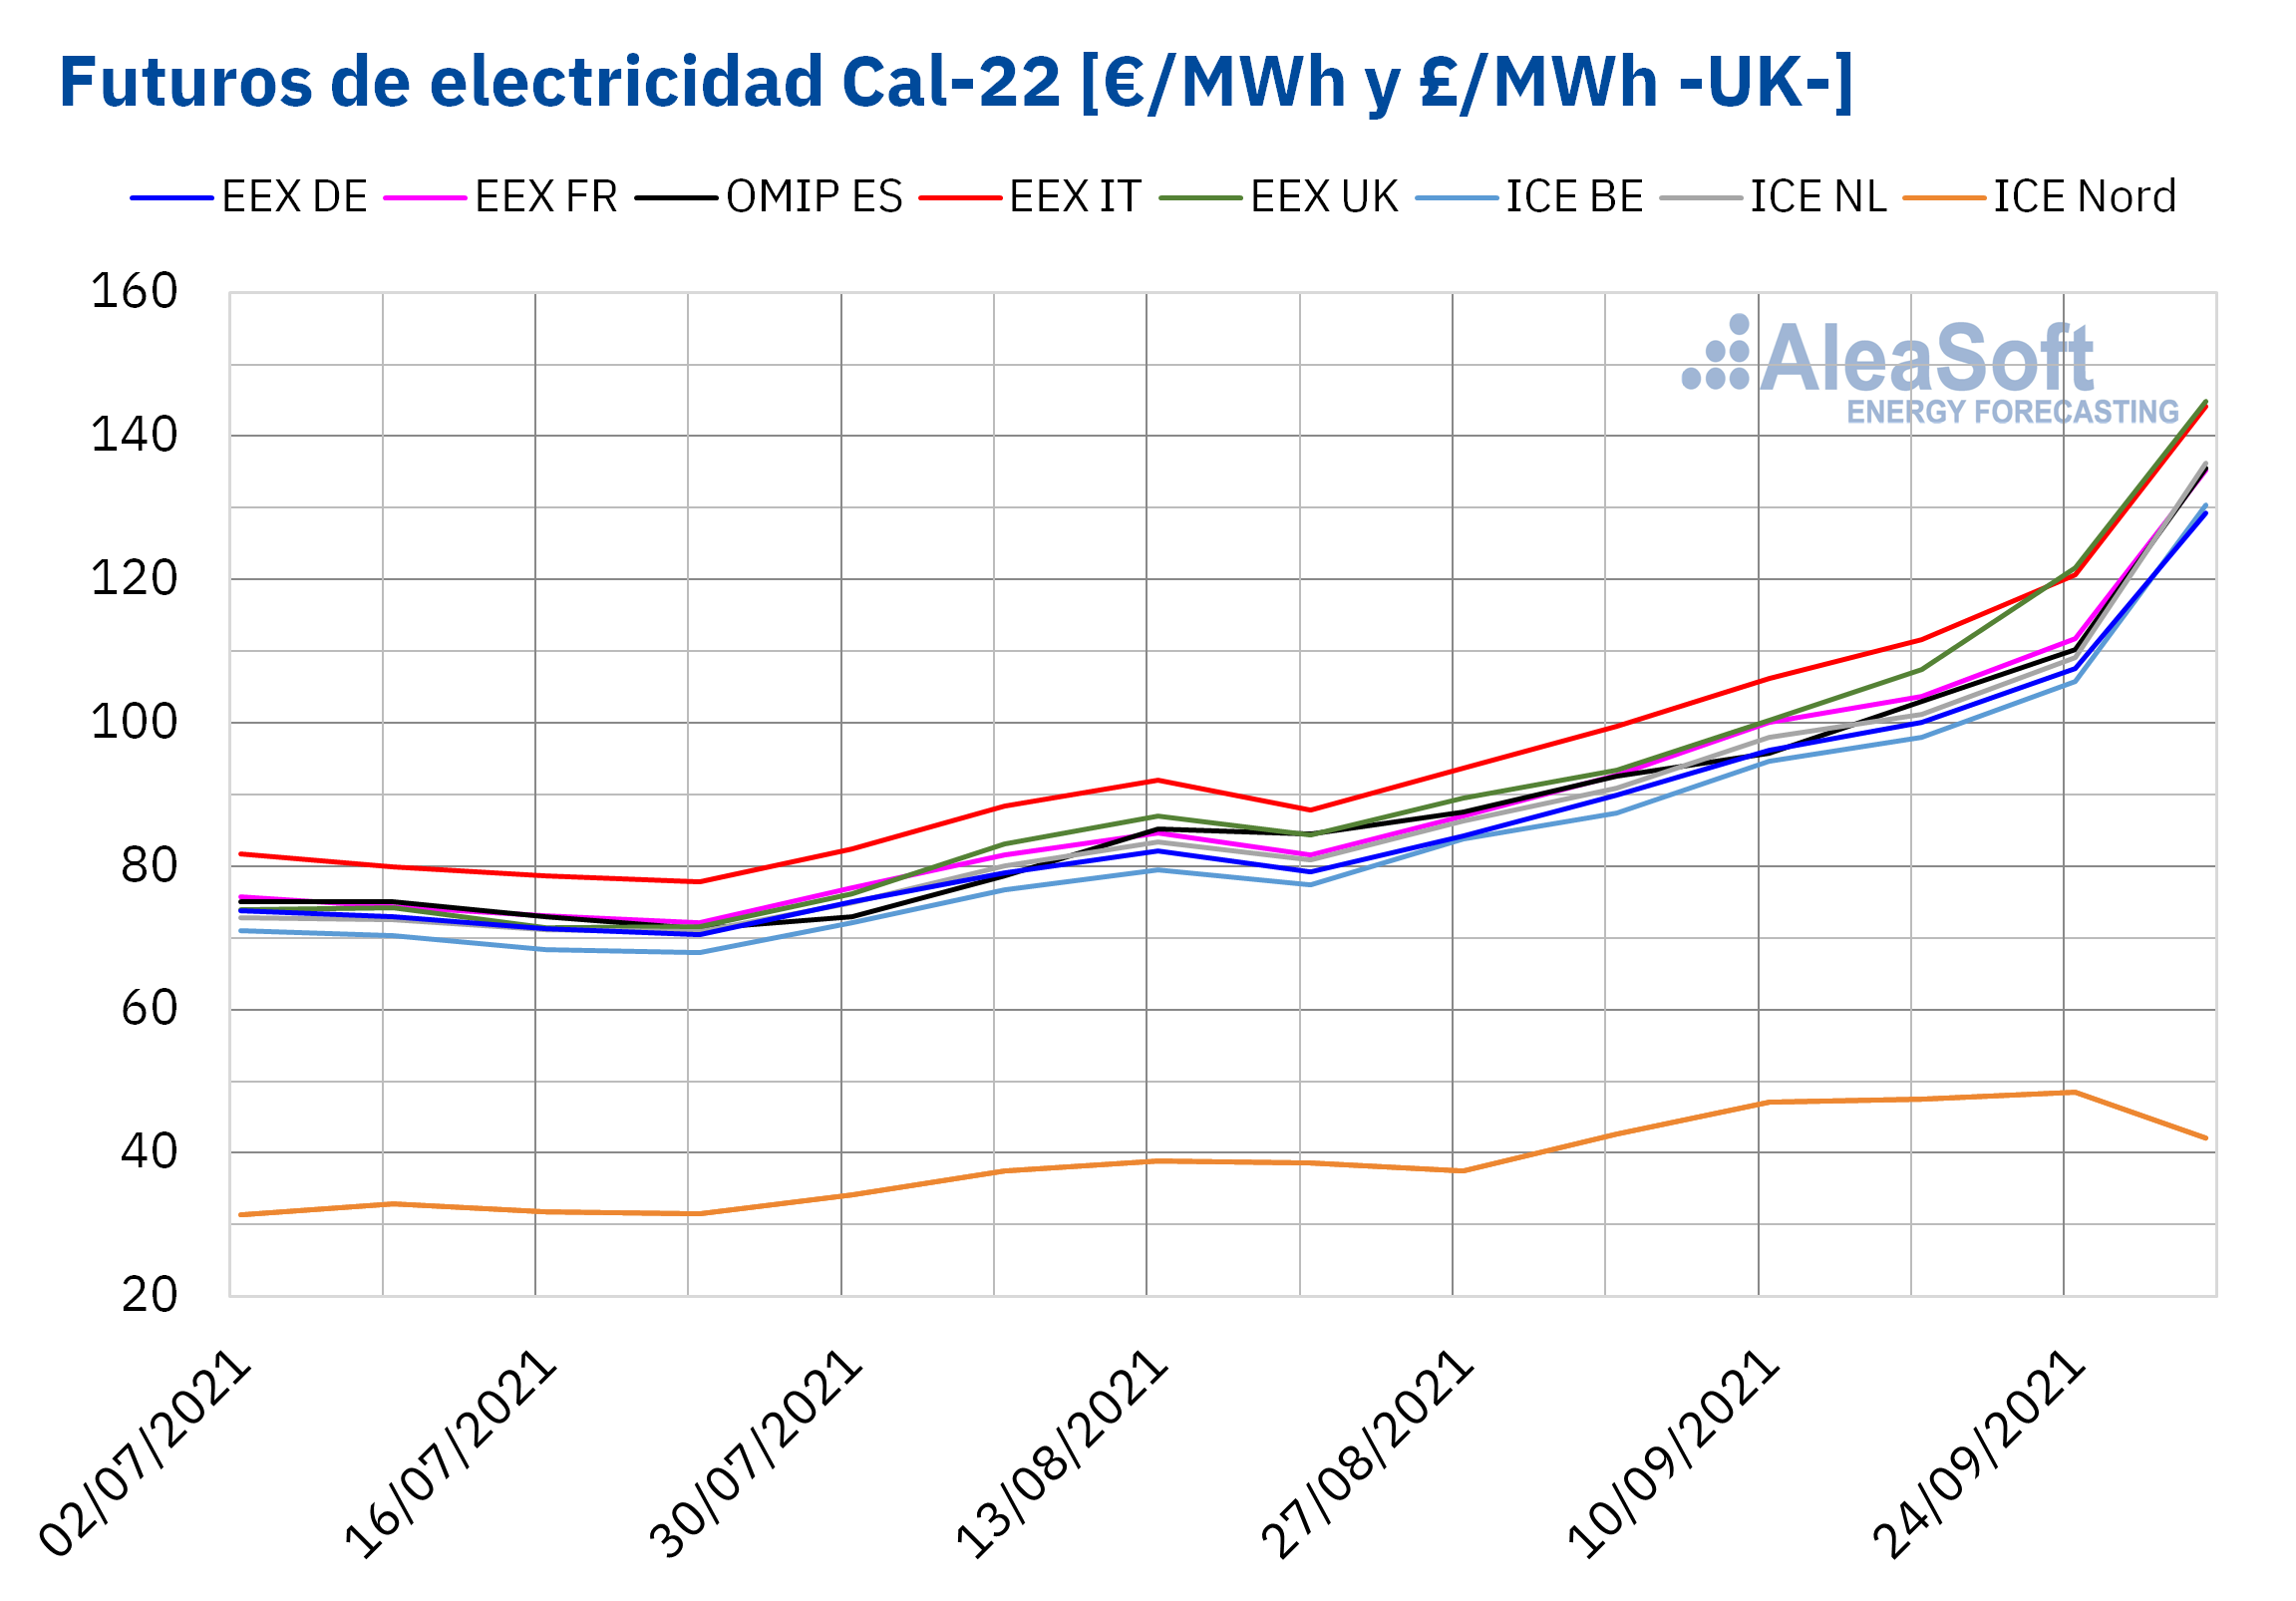 AleaSoft - futuros electricidad cal 22